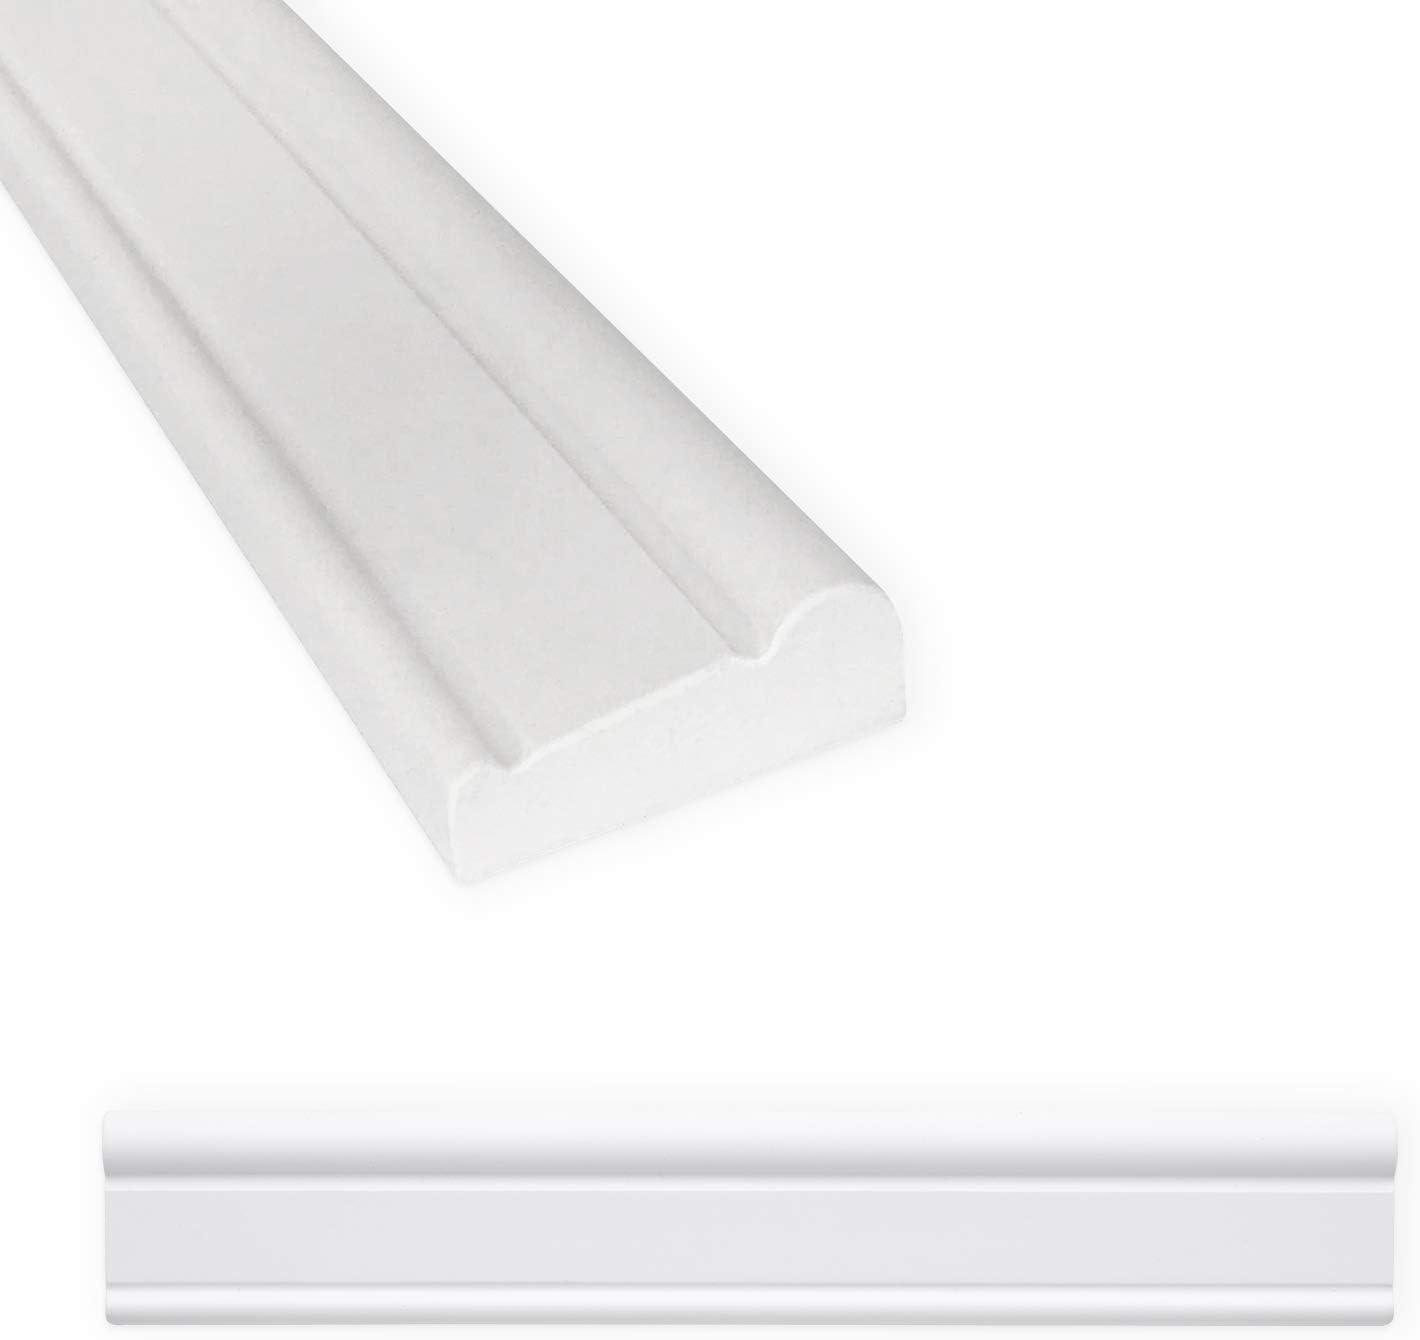 Chair Rail Tile Trim 2 X 12 Inch Decorative Shower Ceramic Tile Edge Liner Backsplash Wall Molding Matte Bright White 6 Pack